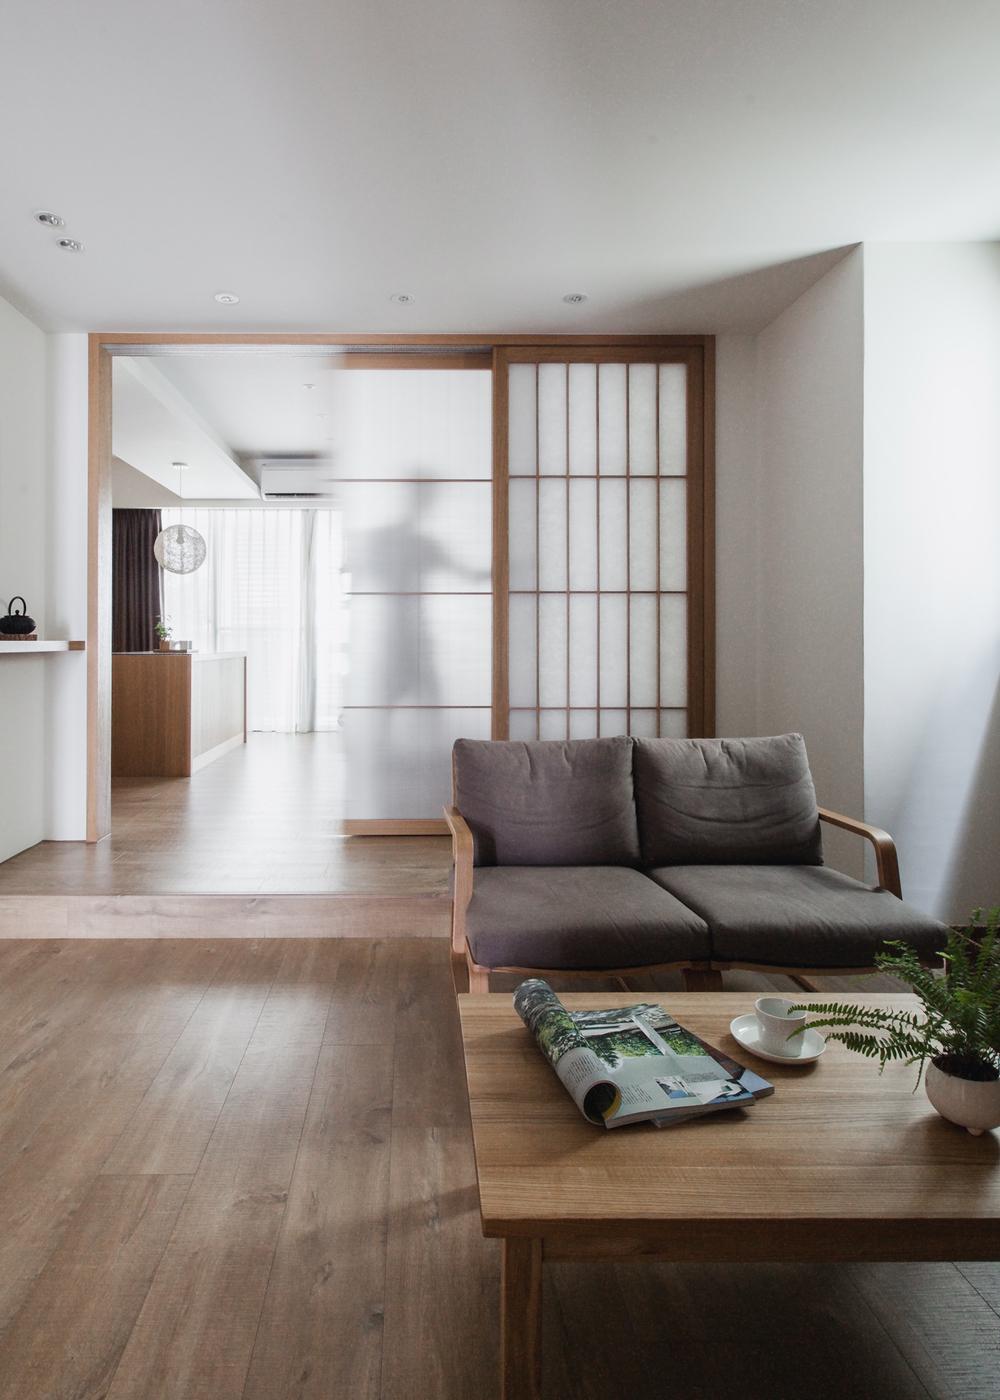 Interiors-56.jpg